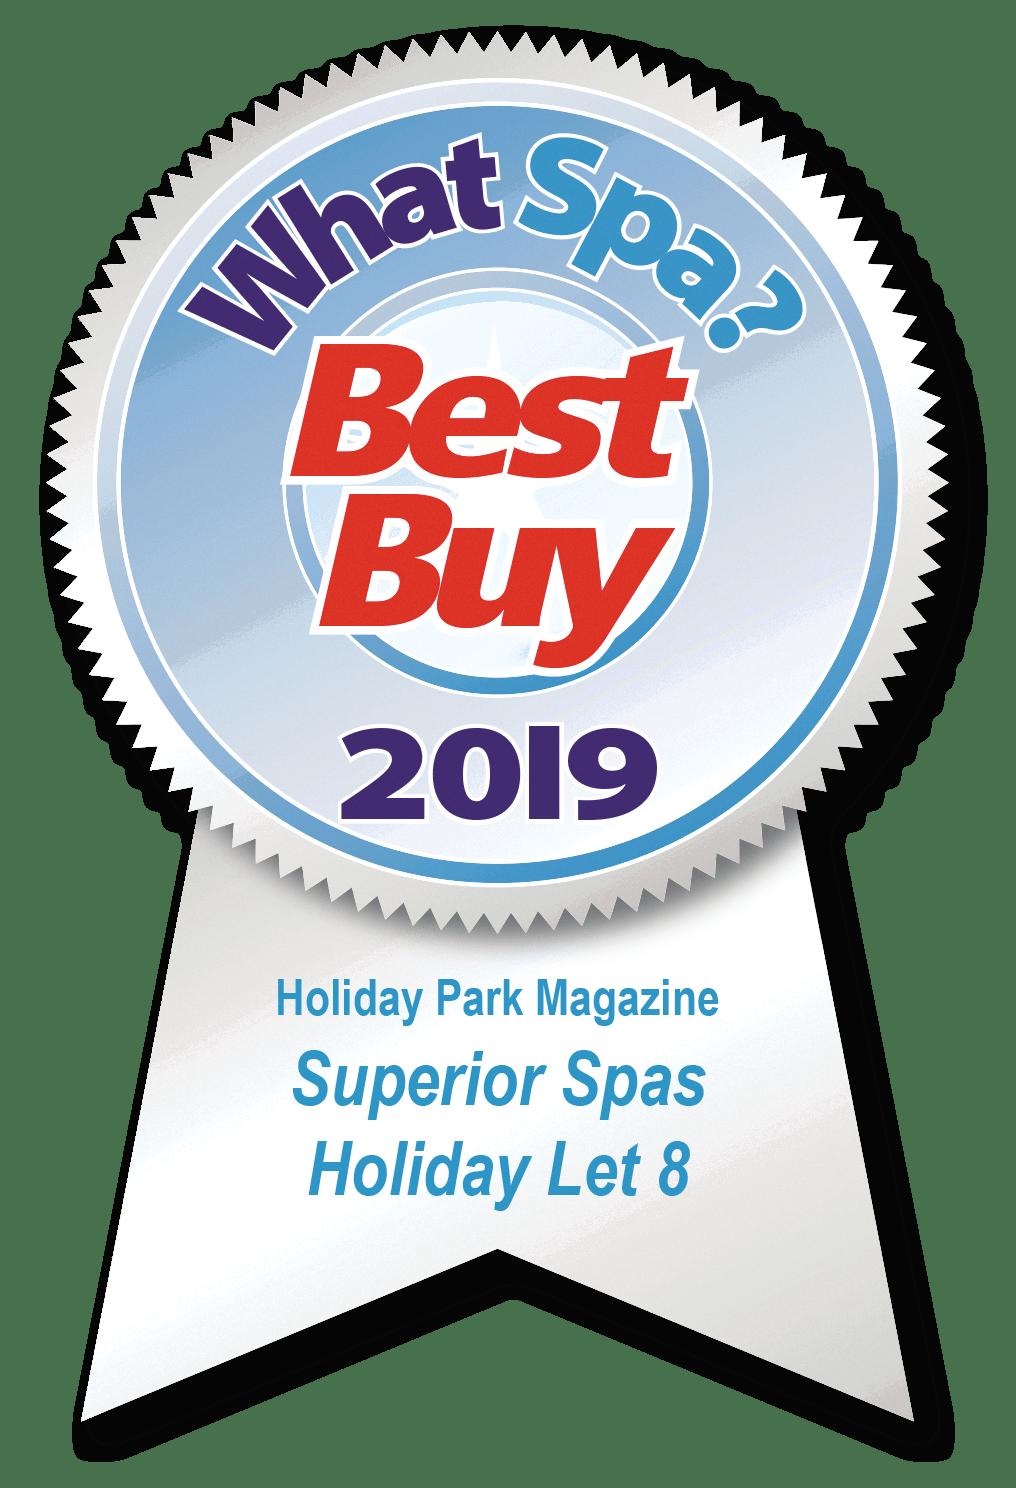 What Spa Award 2019 - Holiday Let 8